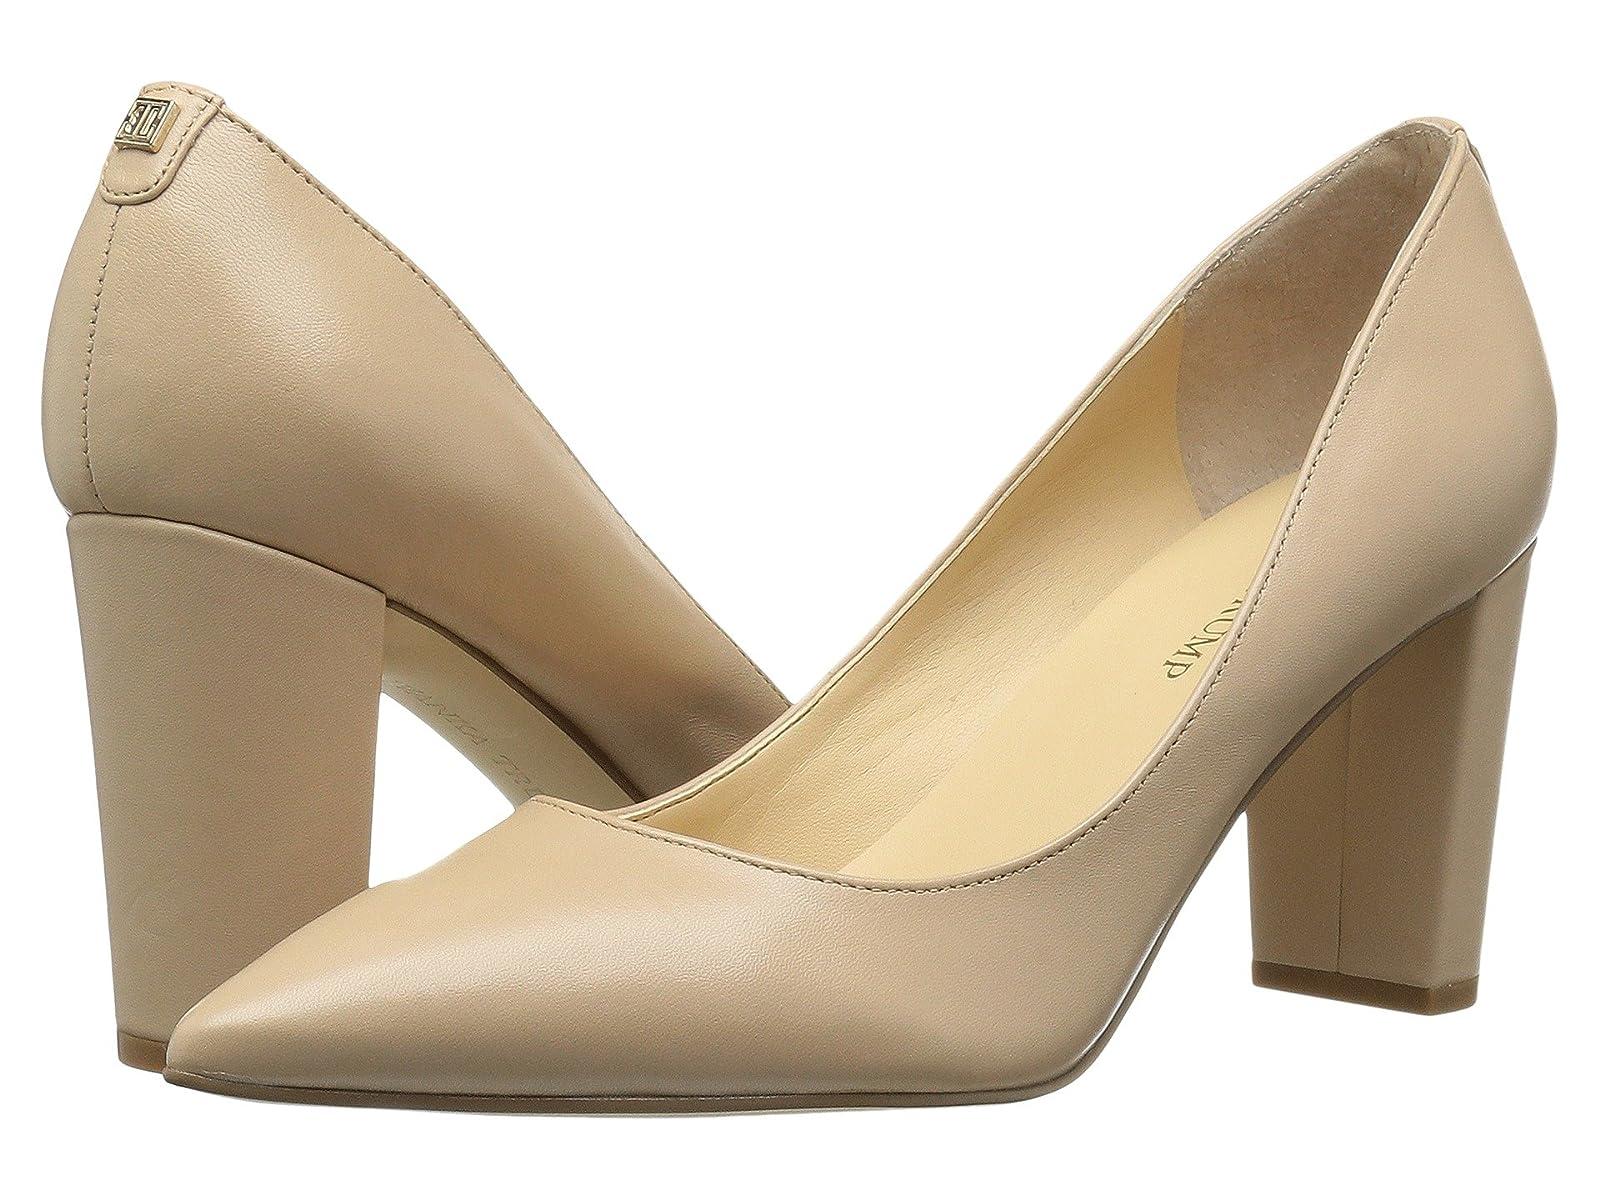 Ivanka Trump LysaCheap and distinctive eye-catching shoes